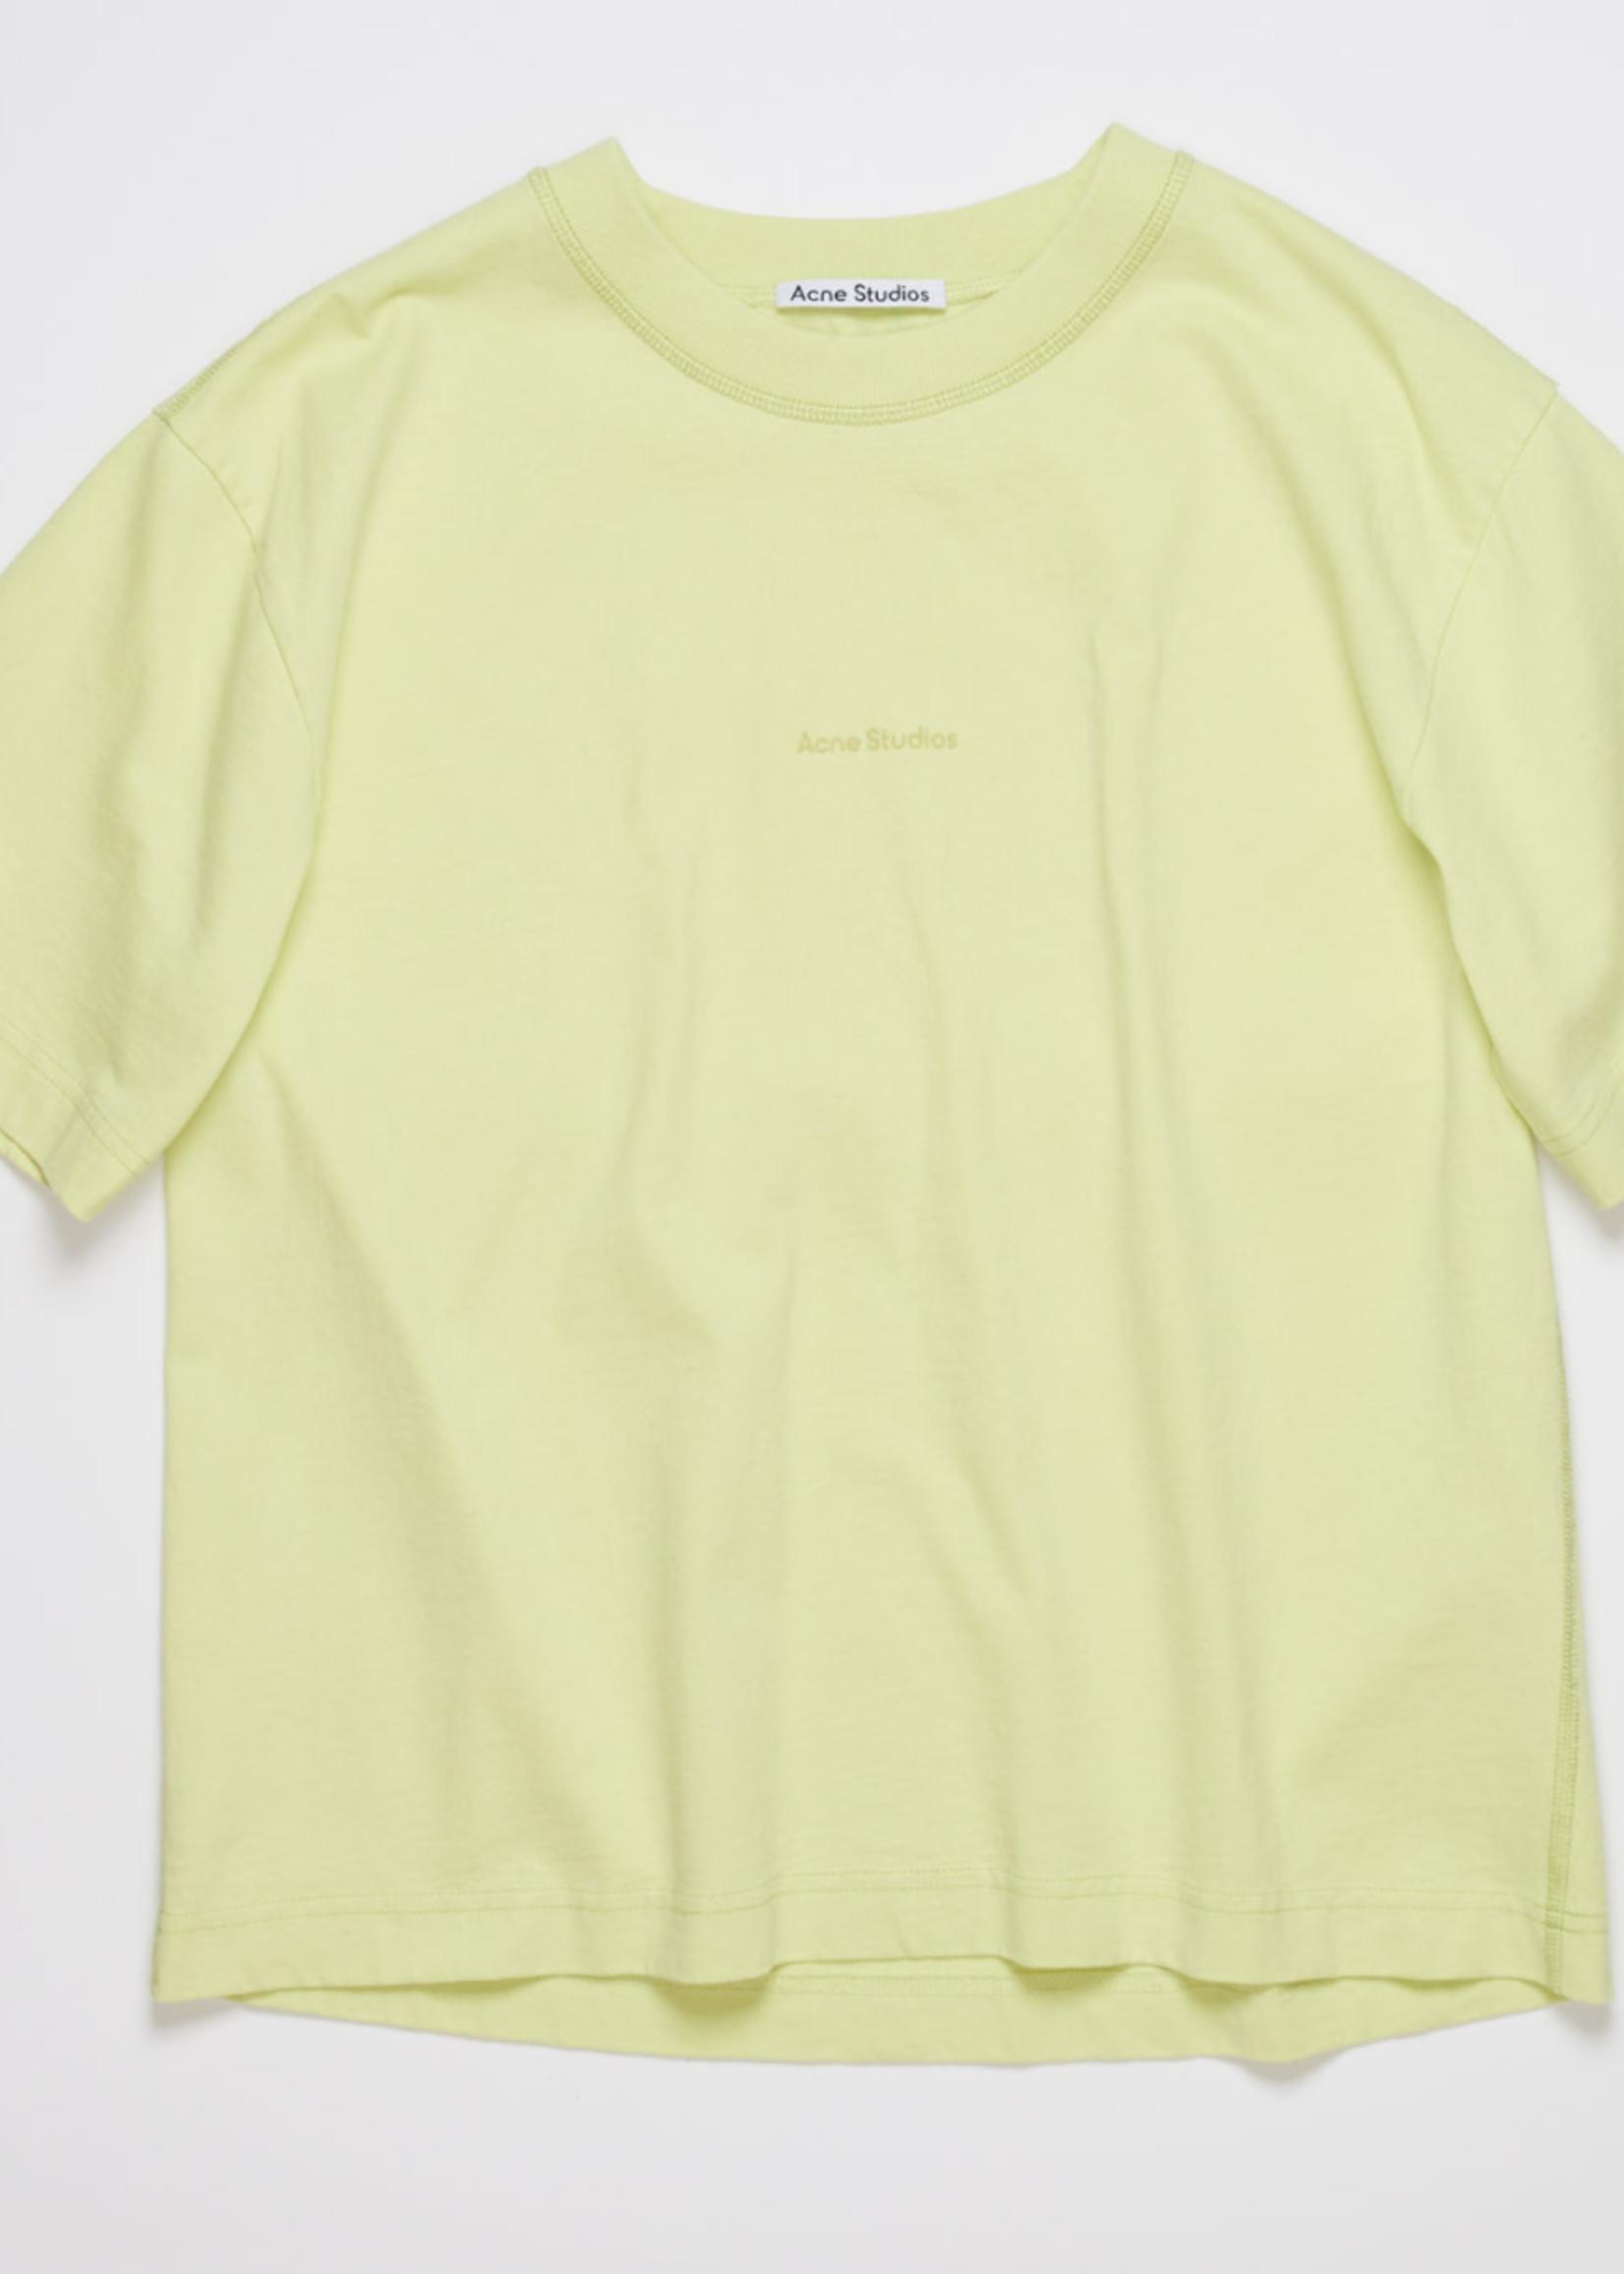 Acne Studios acnestudios edie stamp tee lemon yellow